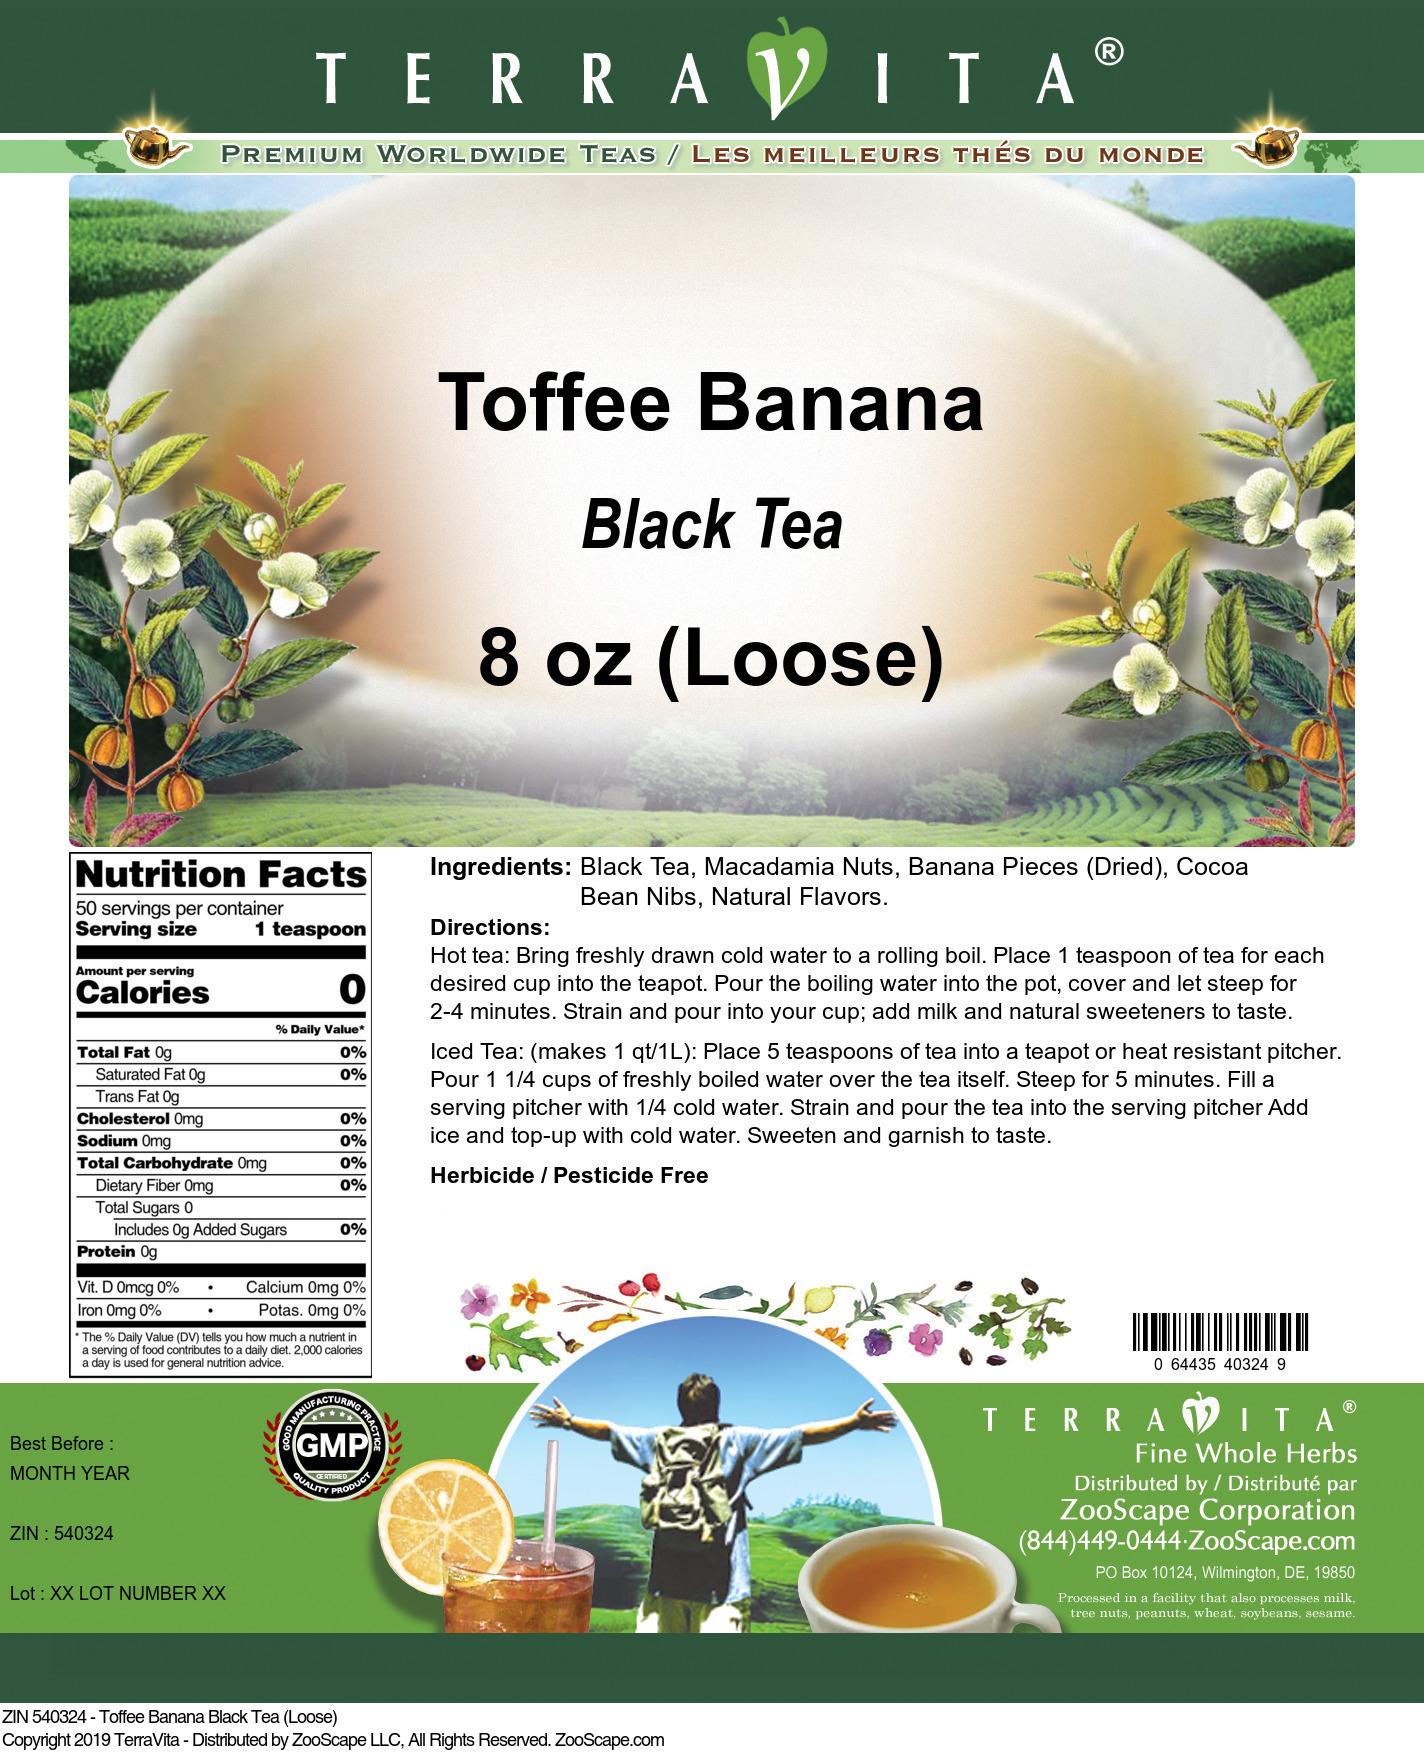 Toffee Banana Black Tea (Loose)